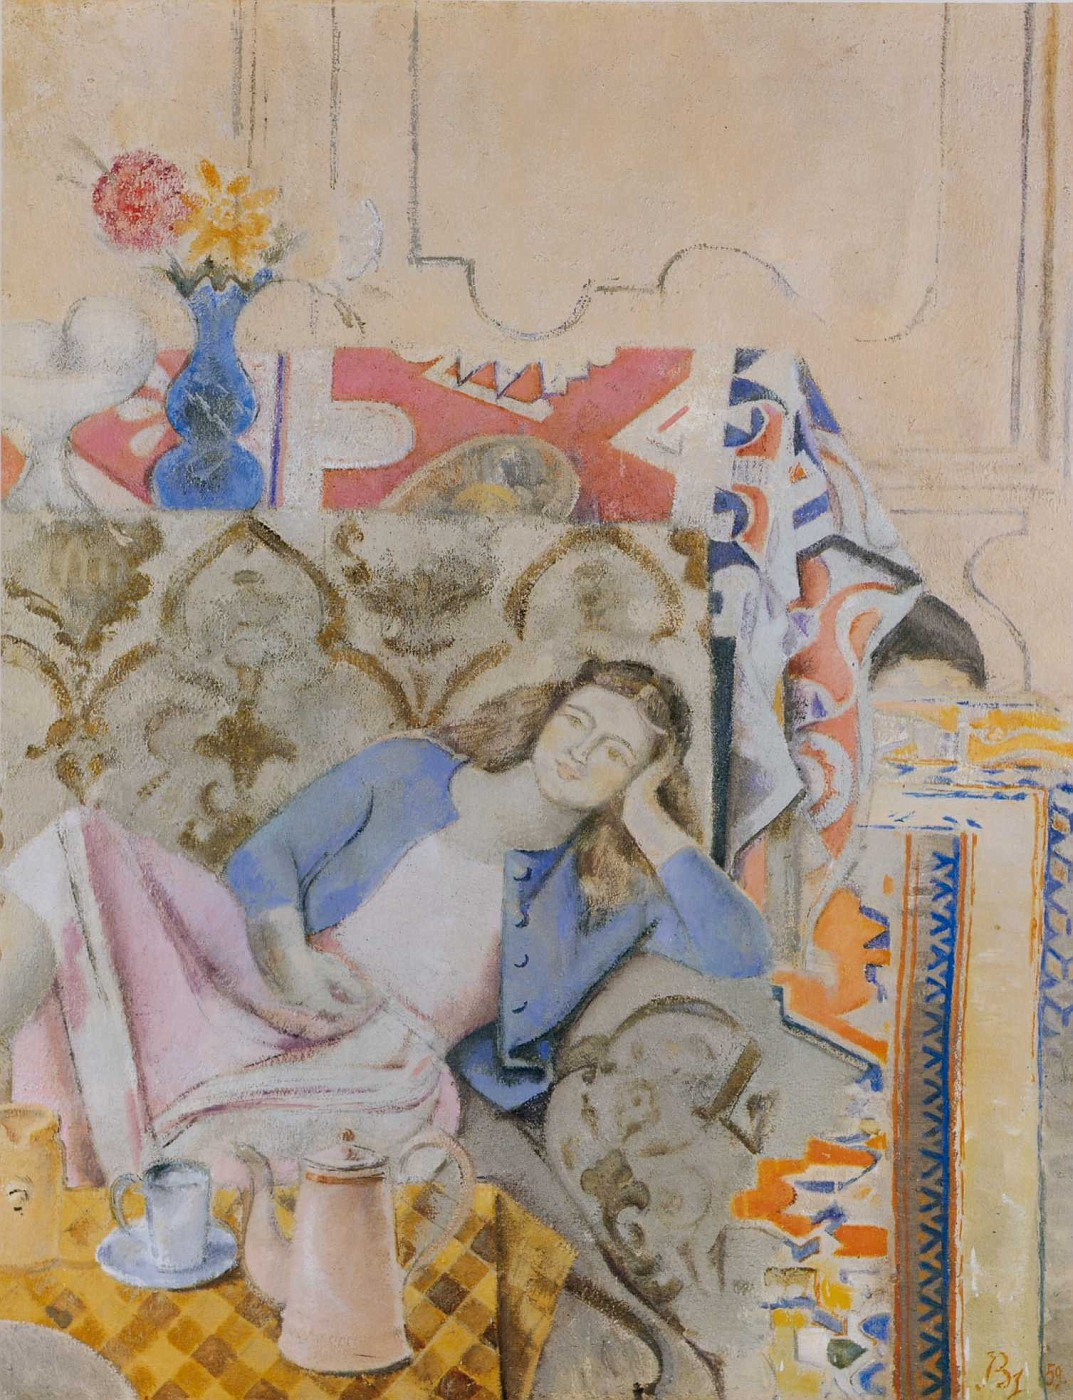 Balthus (Balthasar Klossovsky de Rola). At the coffee table